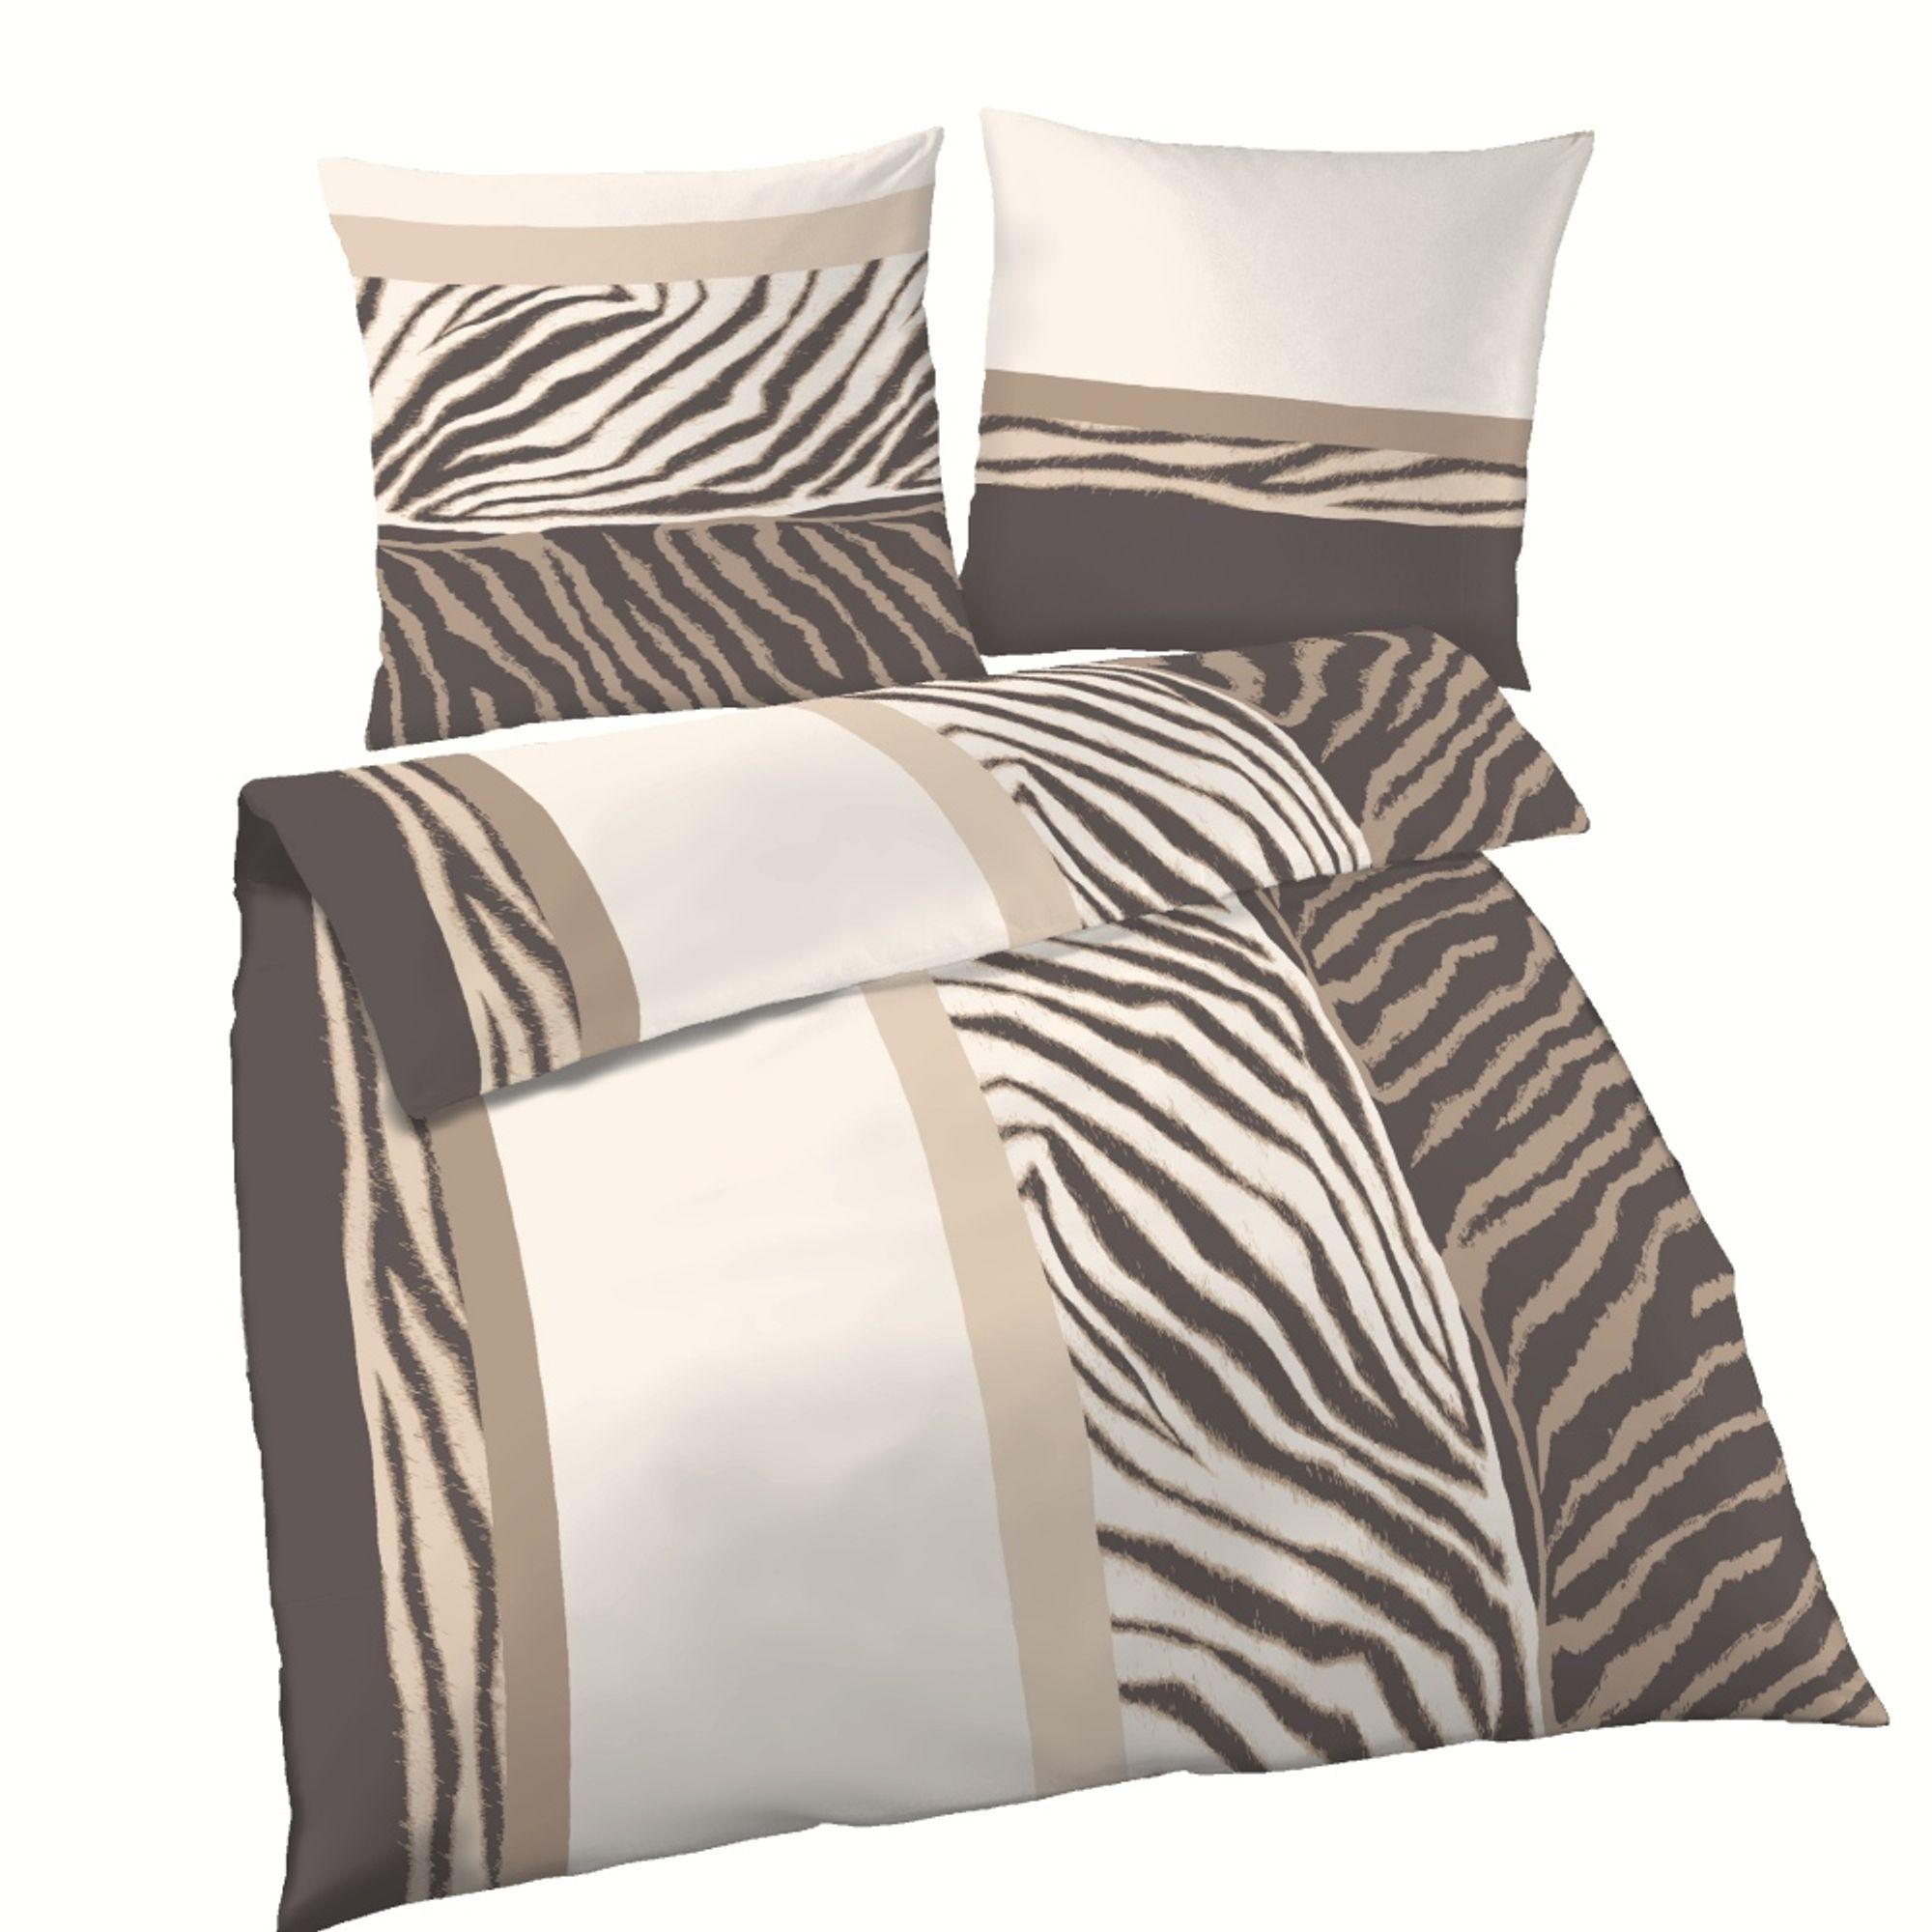 ido renforc bettw sche 2tlg natur braun bettbezug 135x200 cm. Black Bedroom Furniture Sets. Home Design Ideas